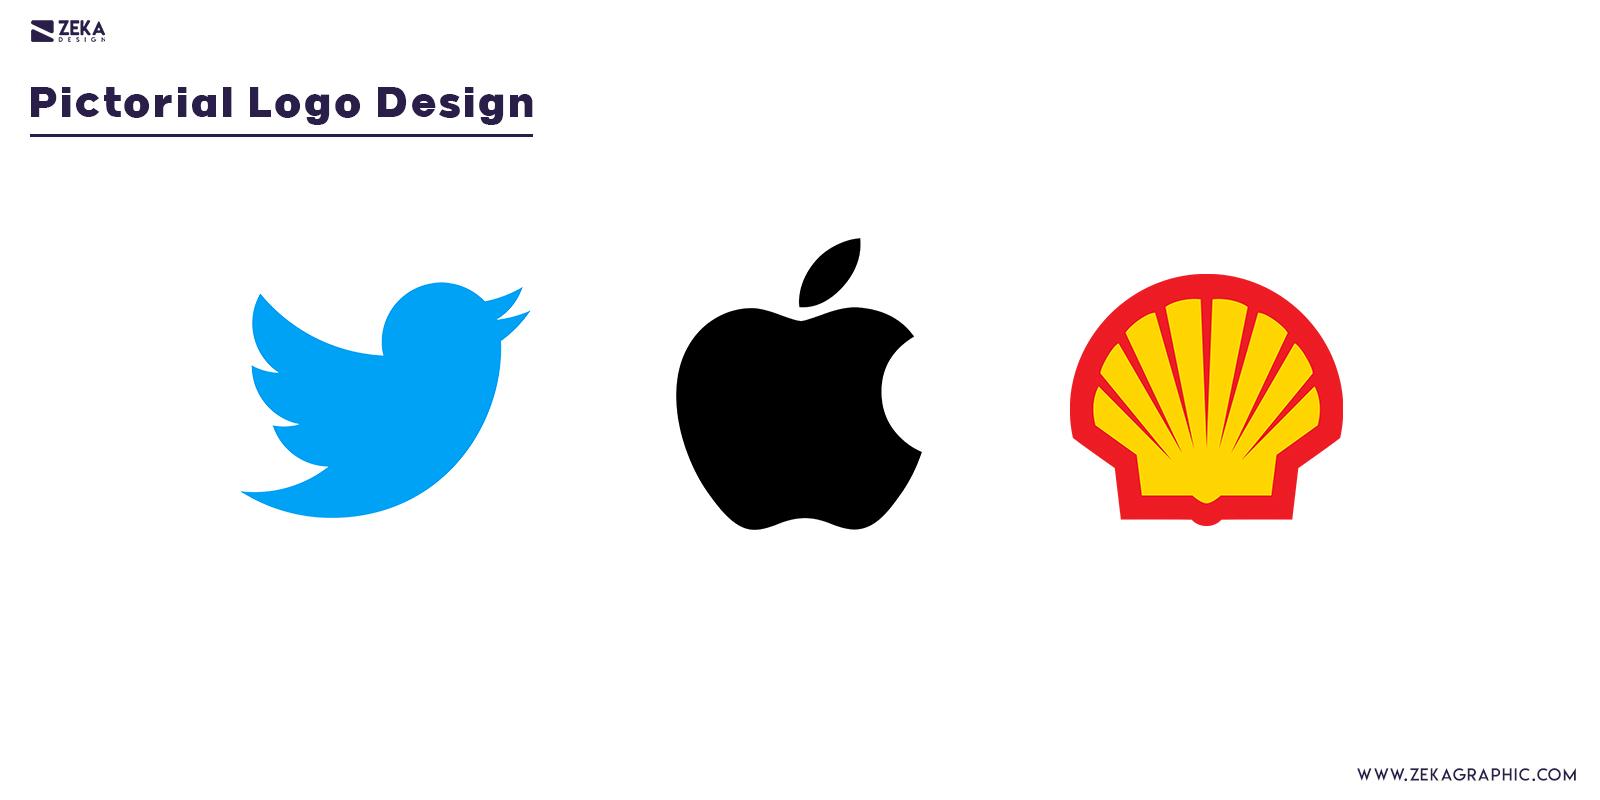 Pictorial Logo Design Type Graphic Design Blog Inspiration